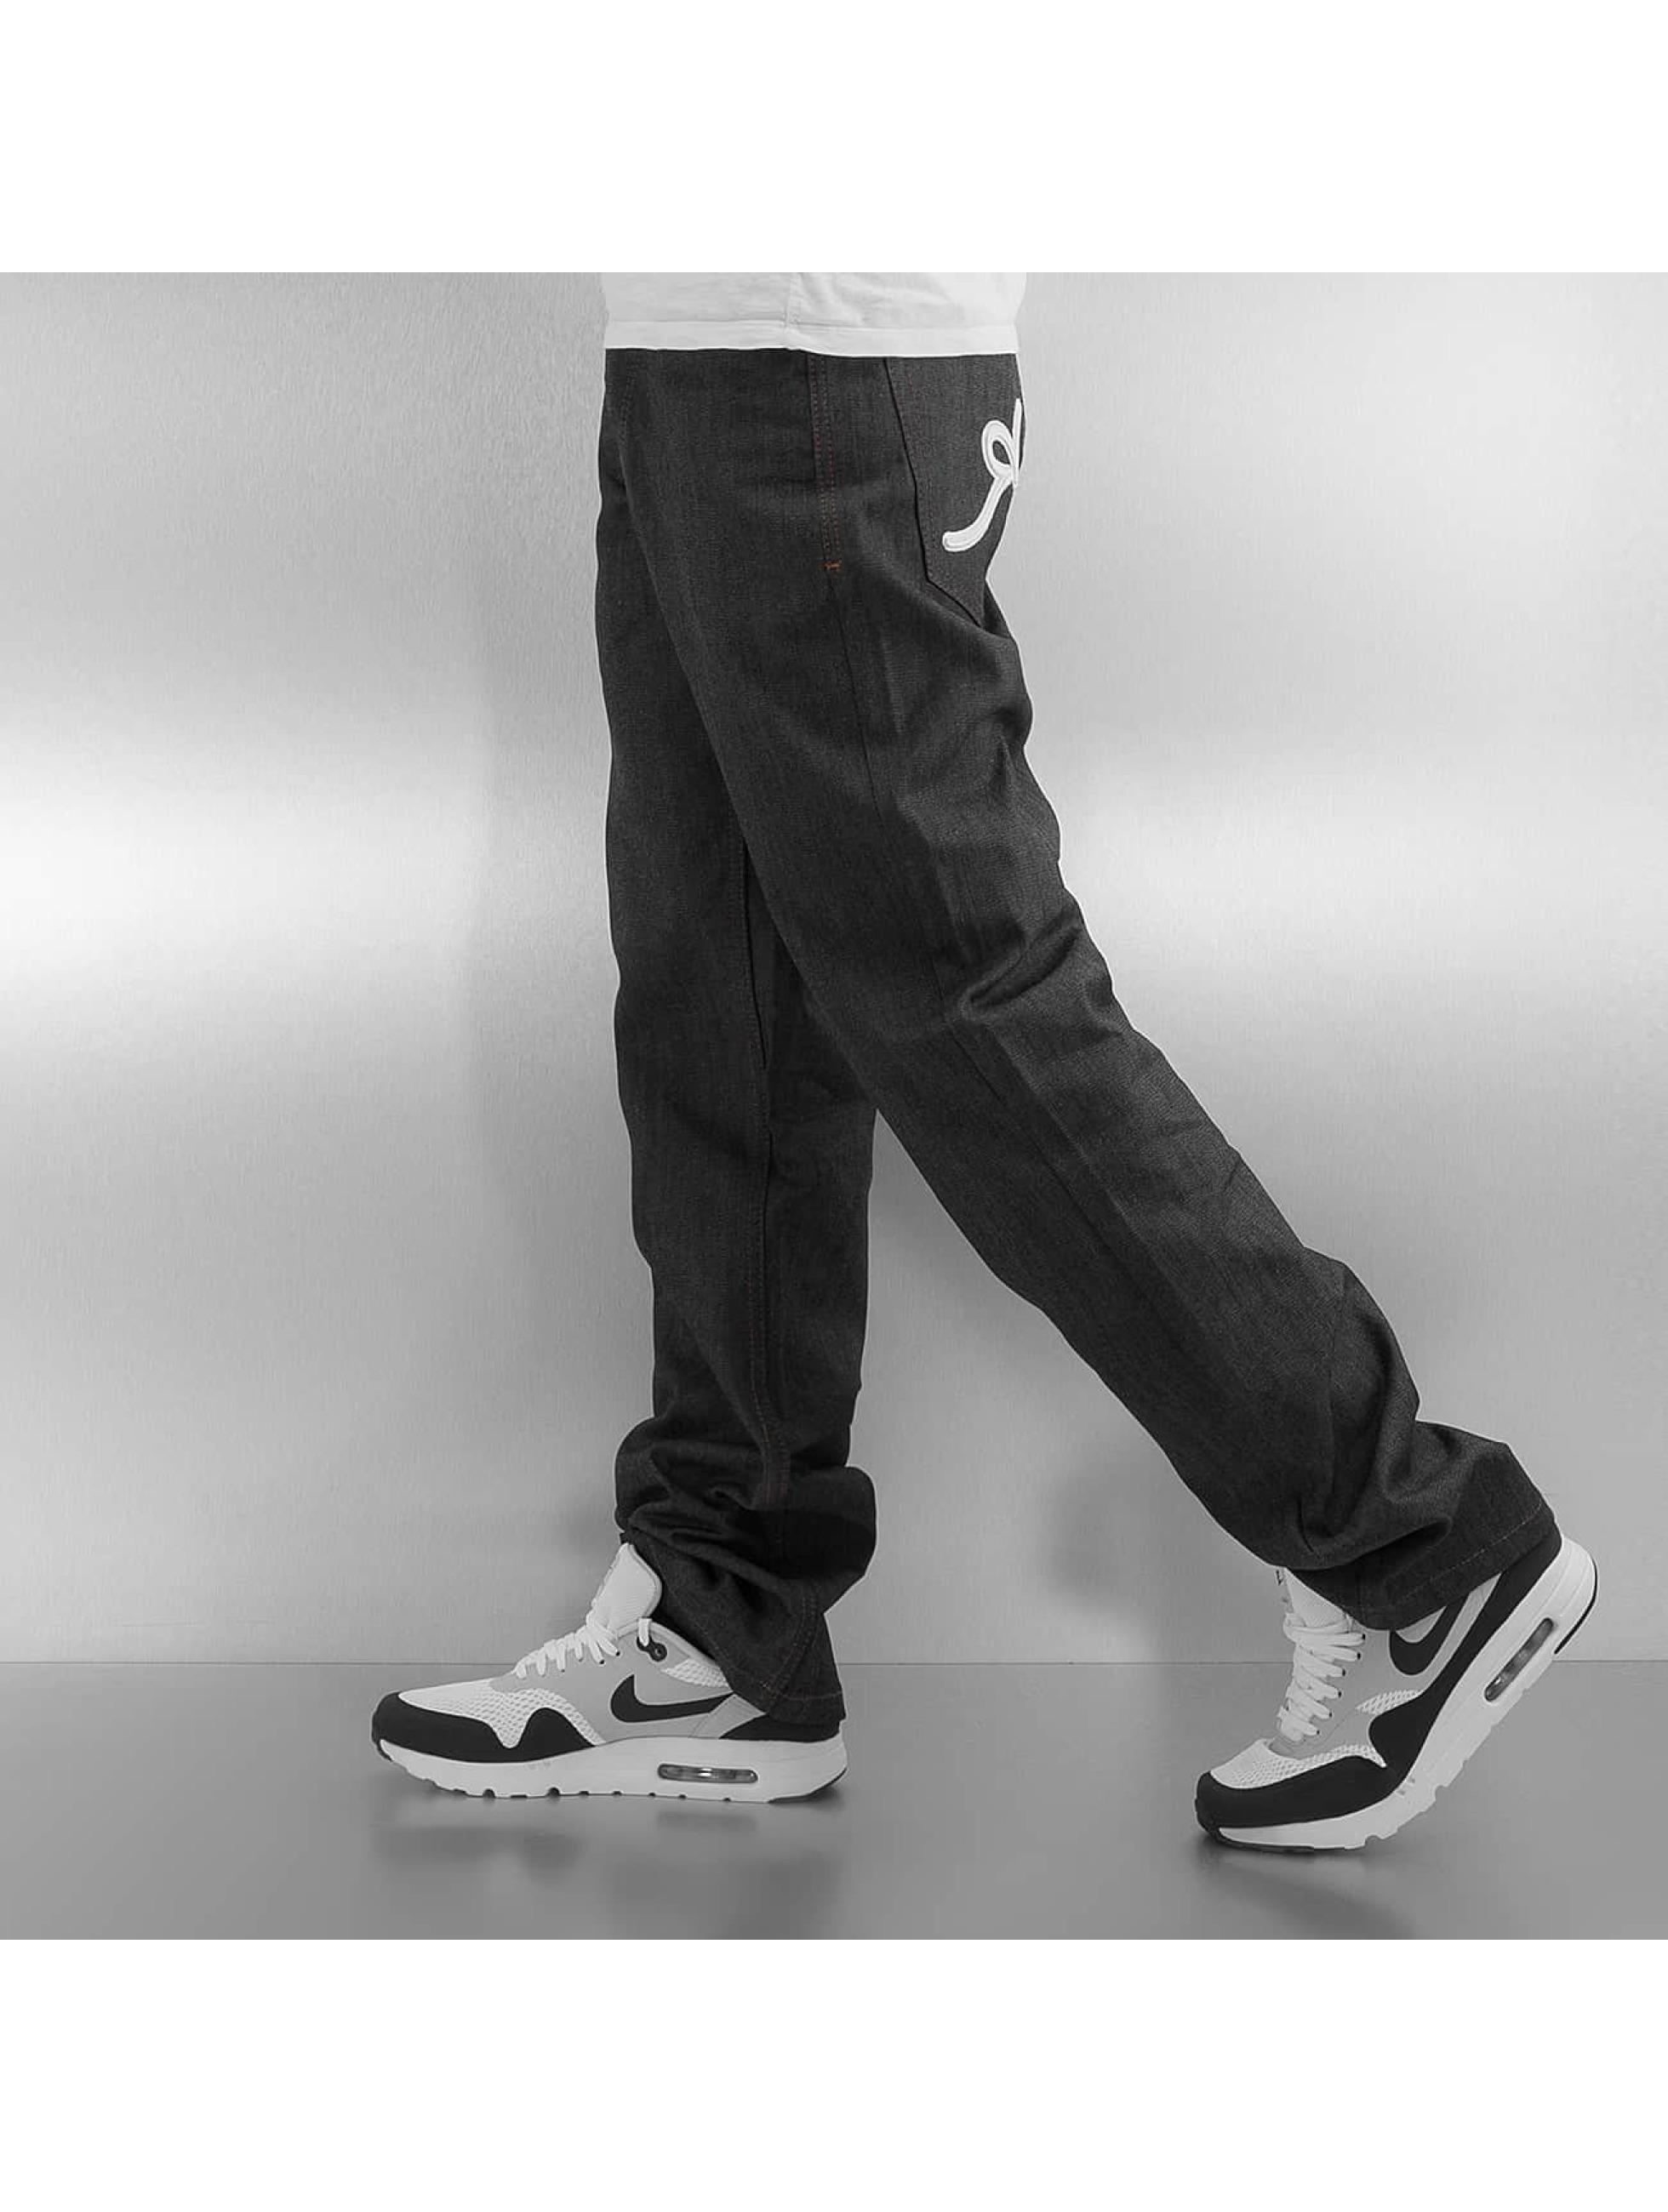 Rocawear Loose Fit Jeans Tap grau